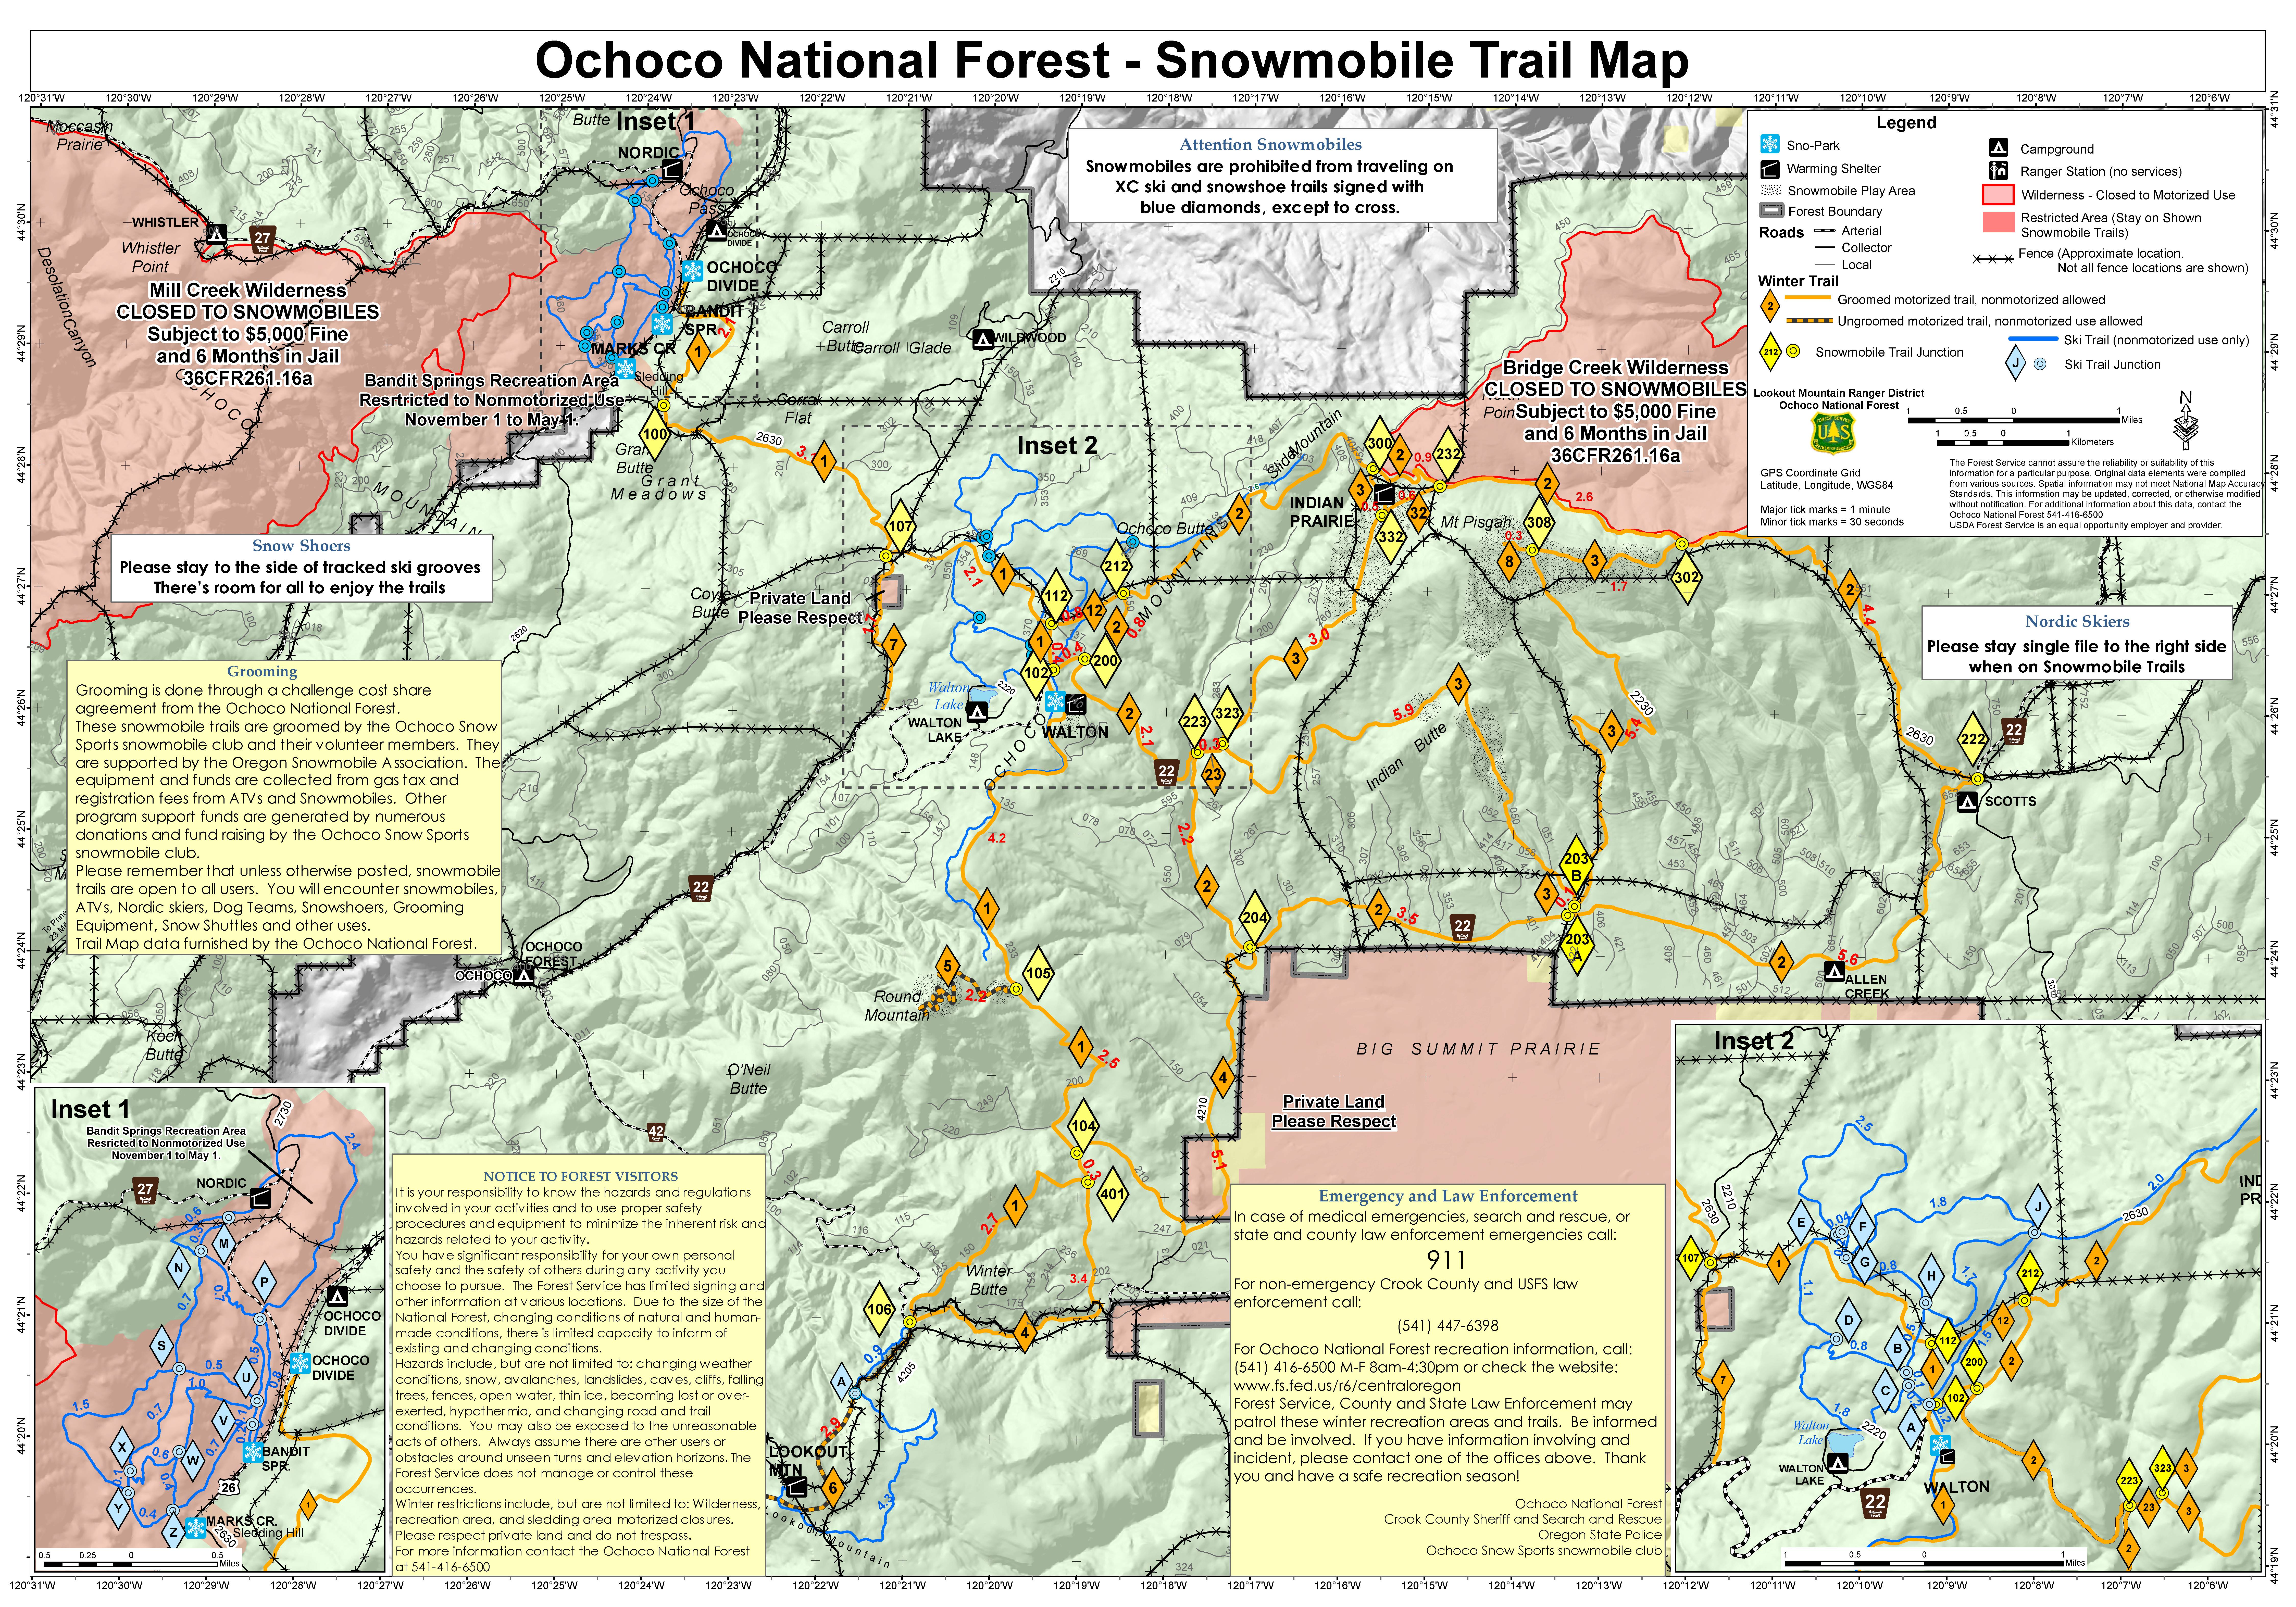 Ochoco National Forest Crooked River National Grassland Ochoco